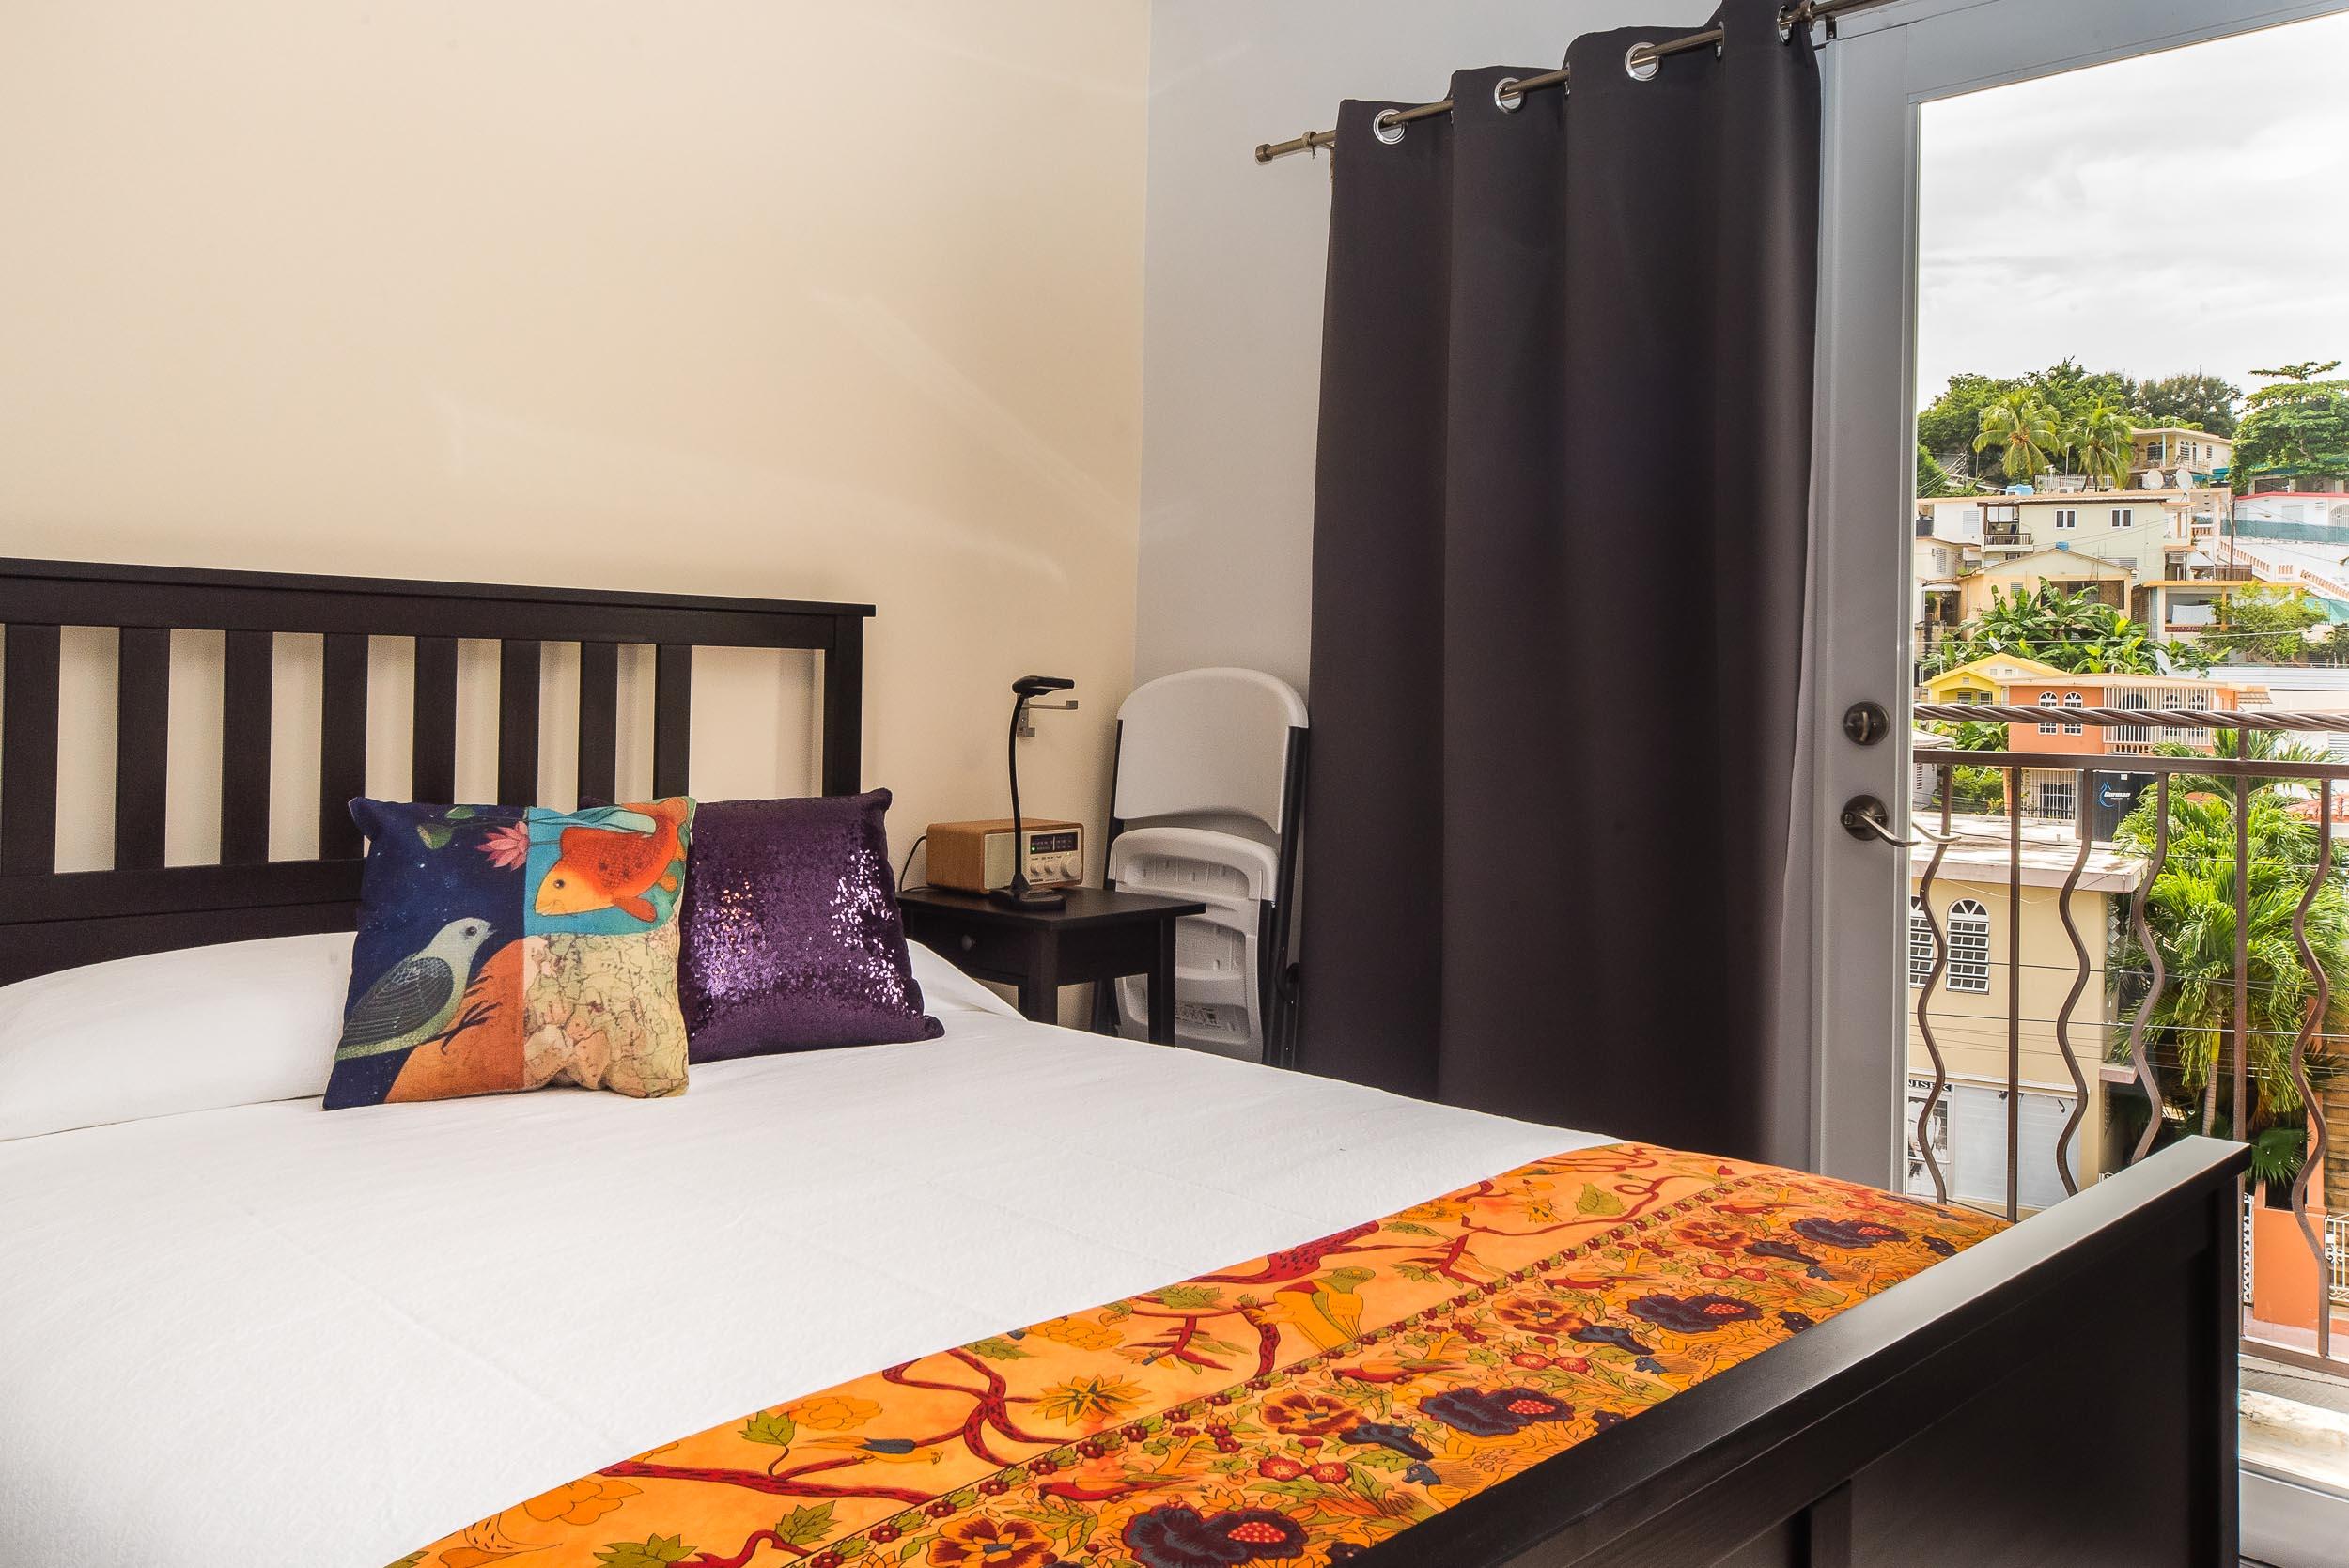 POSADA_room_interiors_FLOOR_3_301-2.jpg